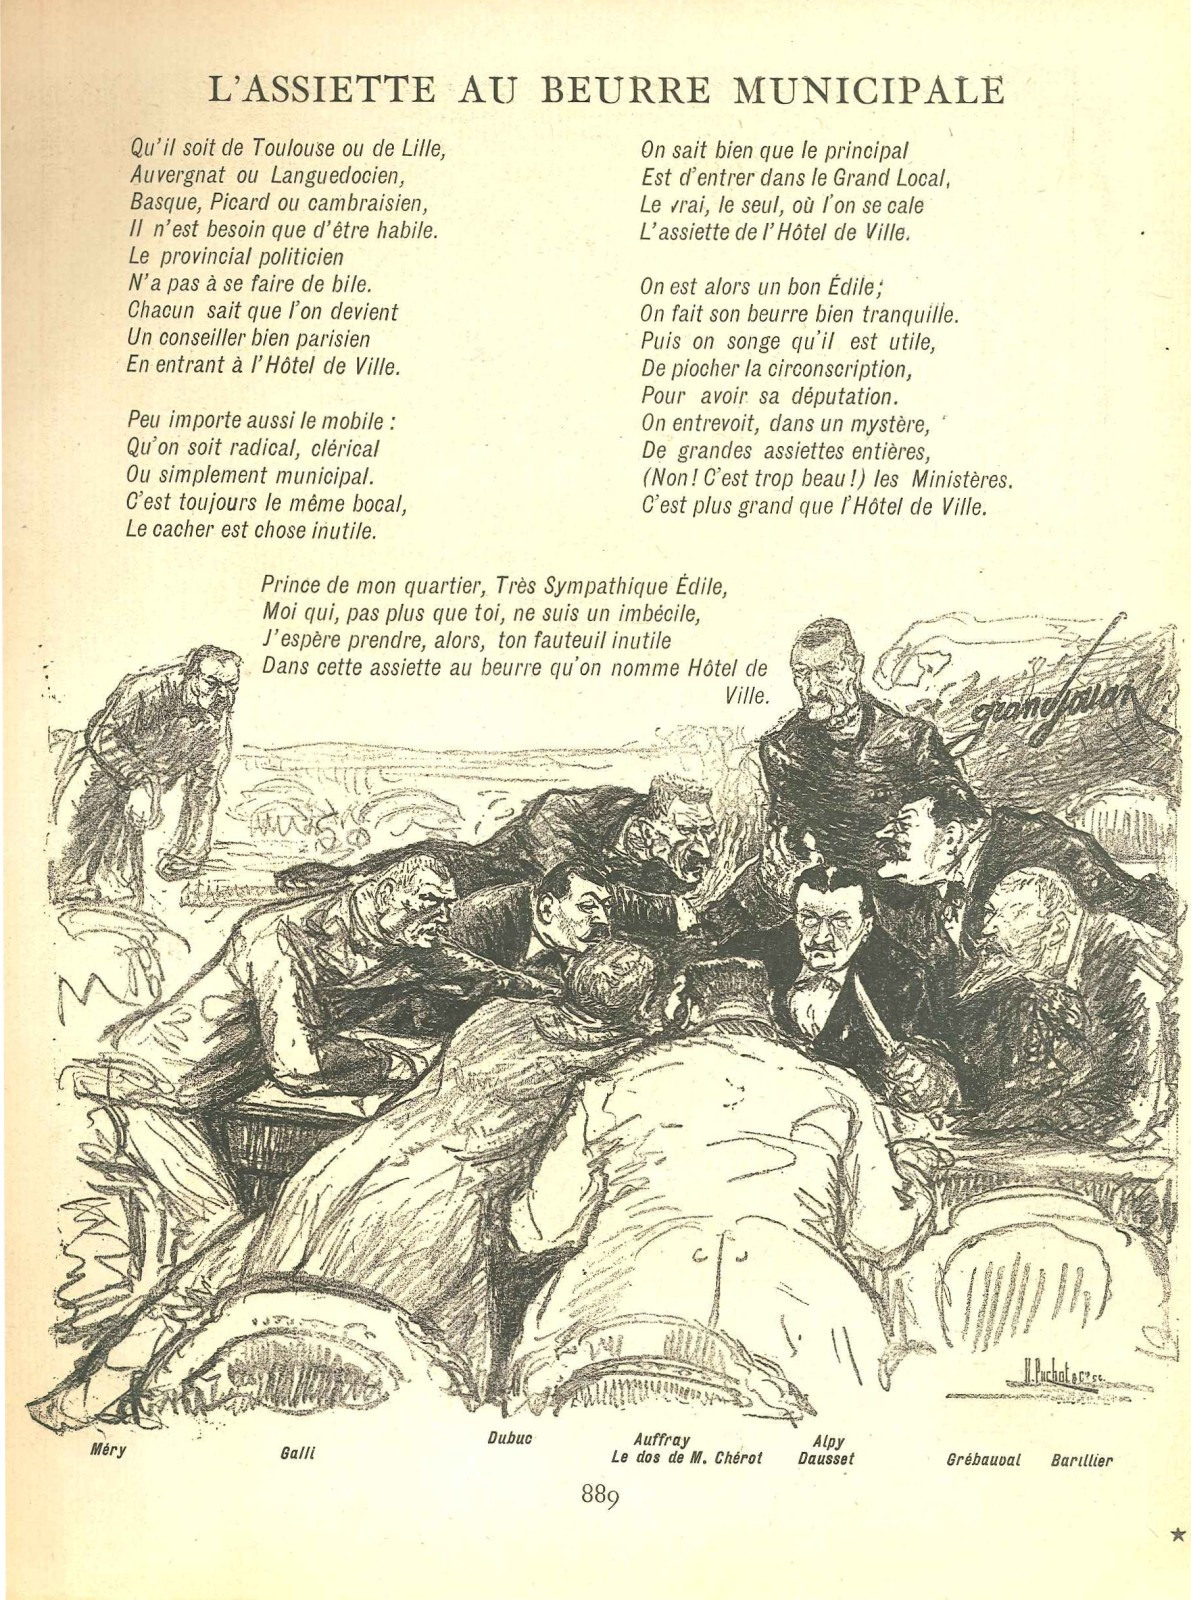 L'assiette au beurre municipale - 1902